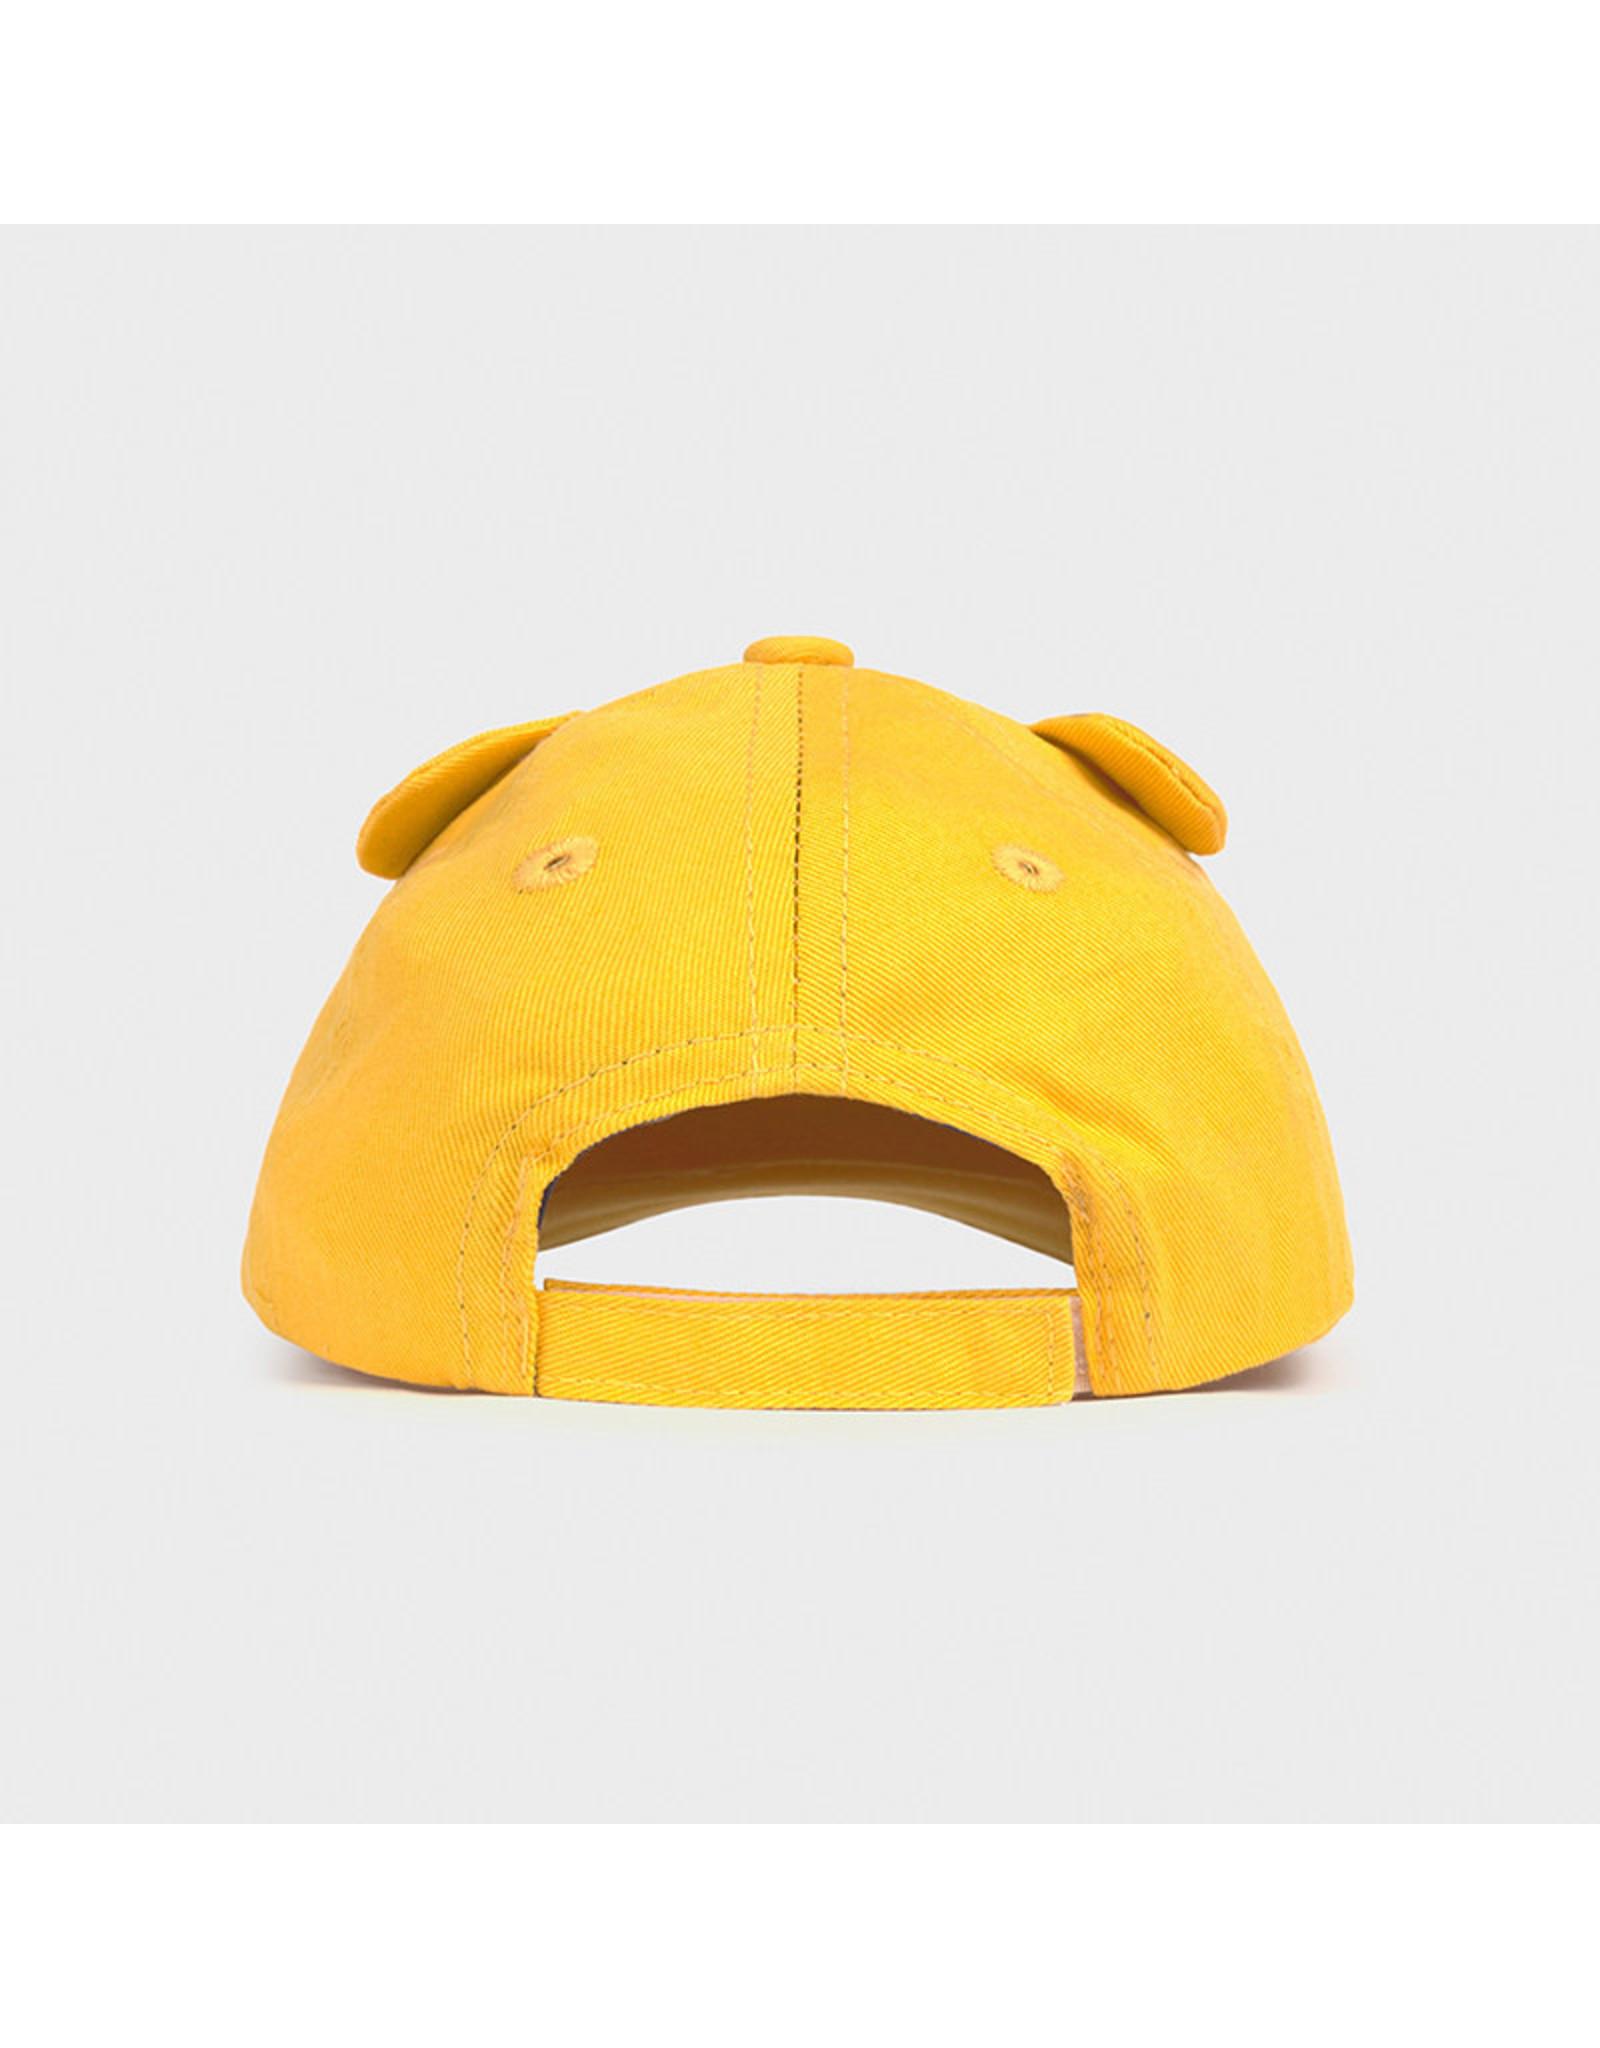 Mayoral tiger beach hat Mango